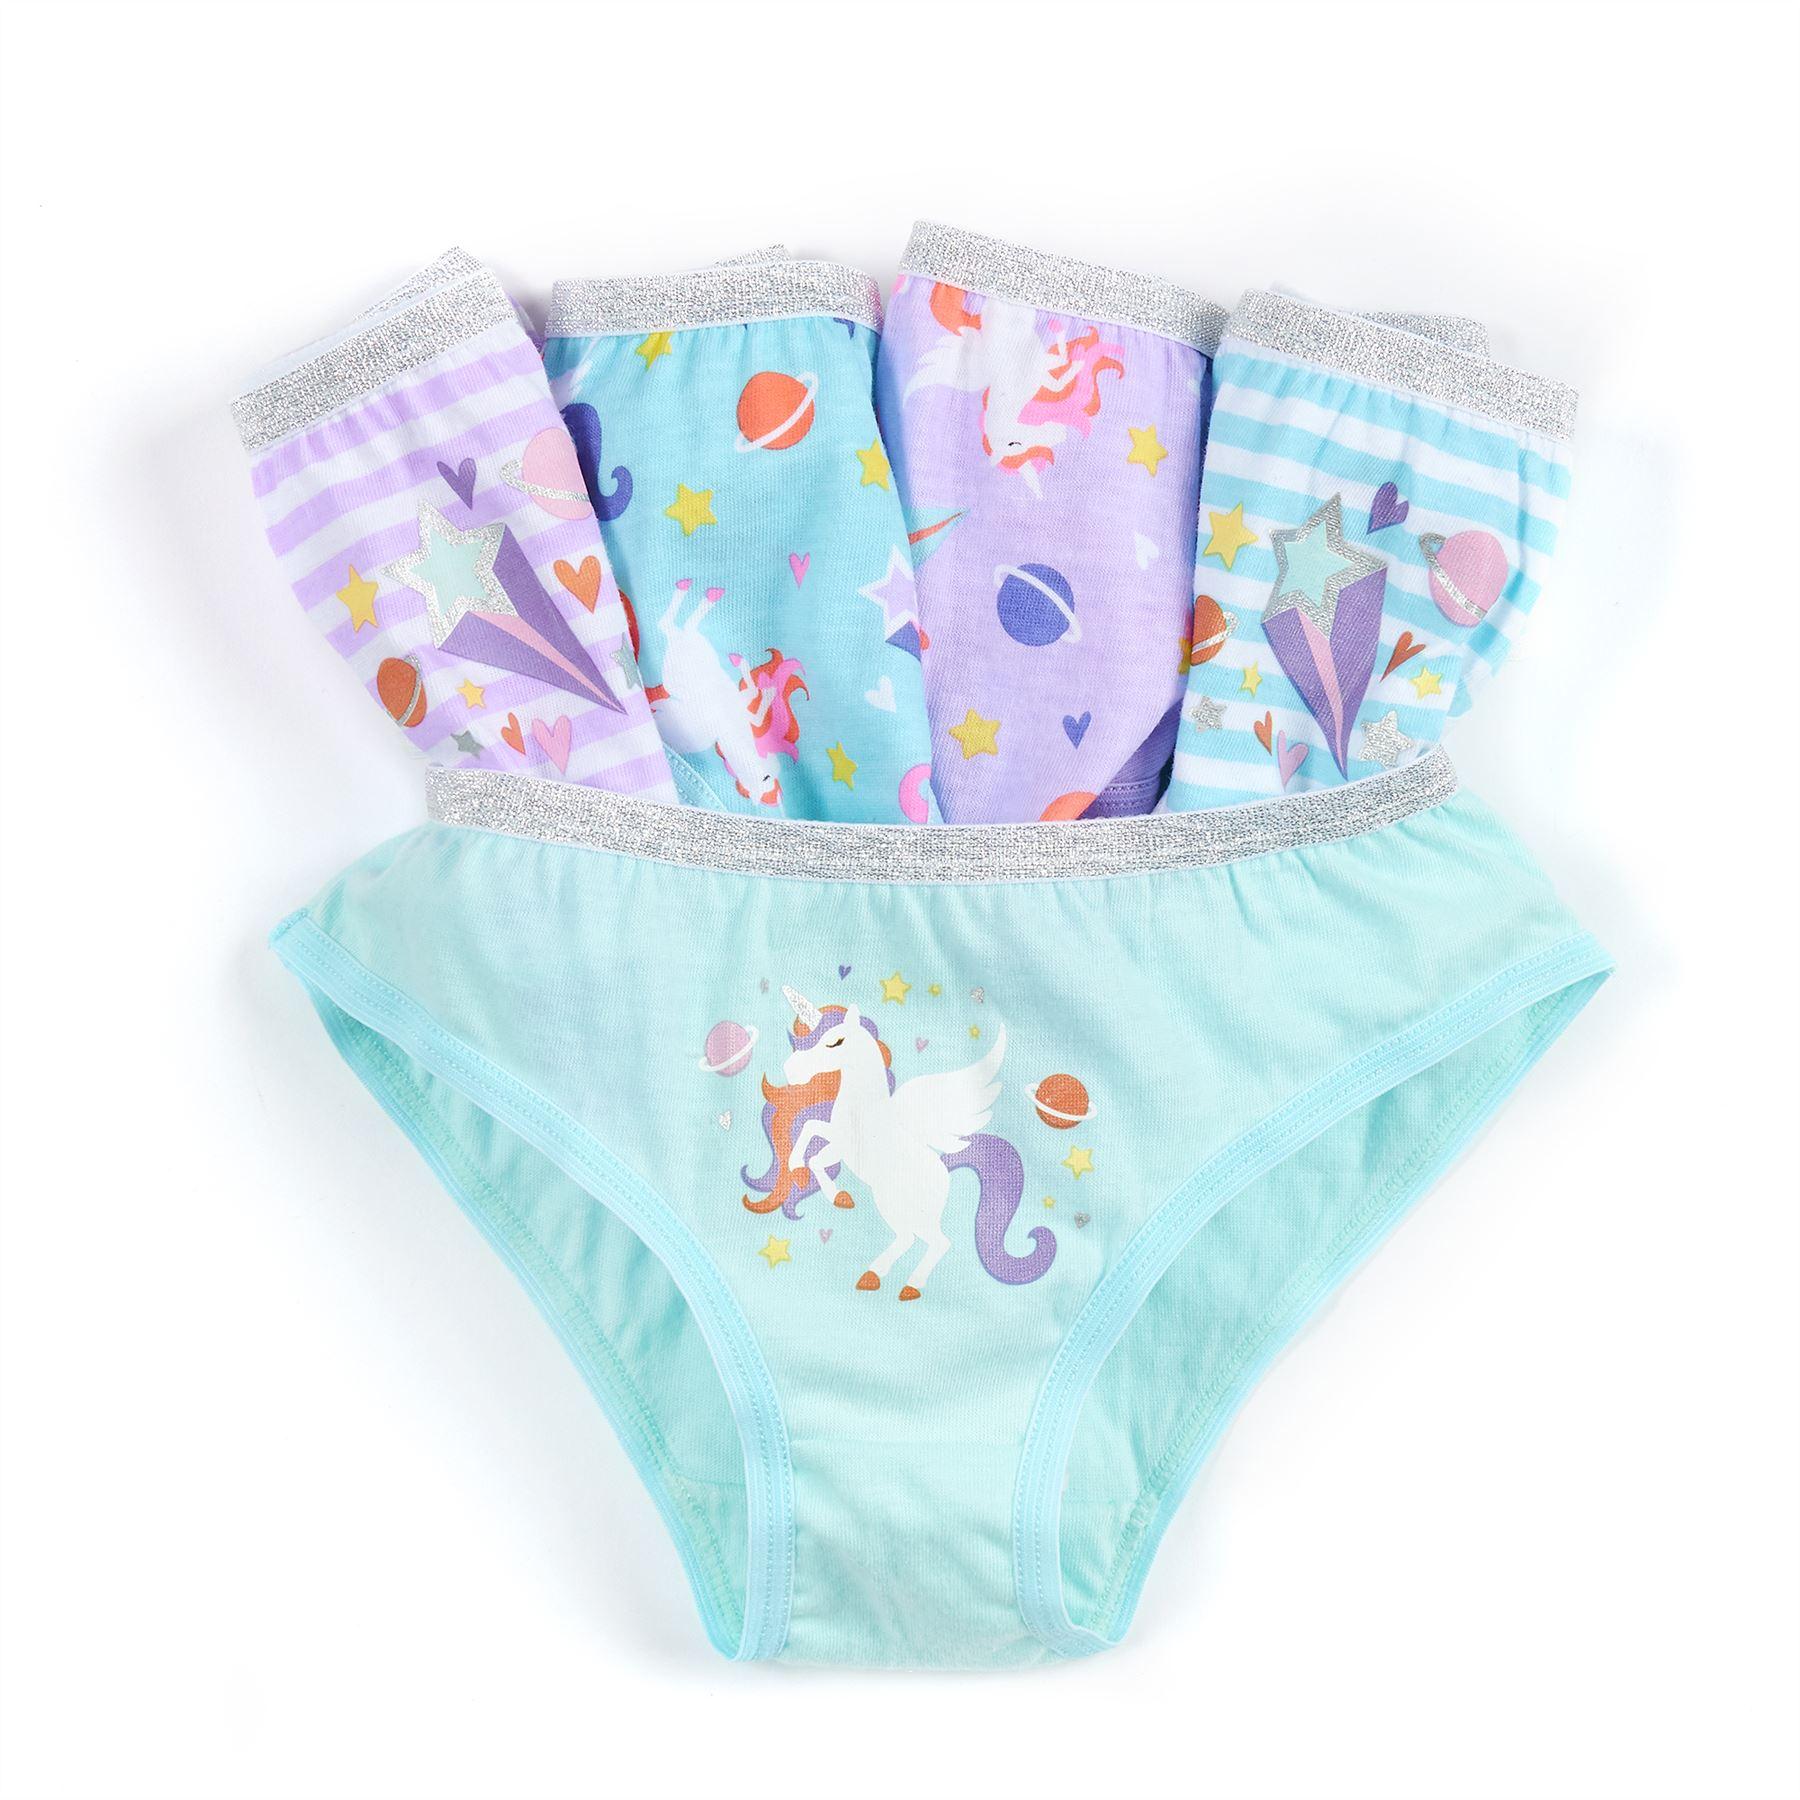 Metzuyan 5 Pairs Girls Briefs Underwear 100/% Cotton Pants Glitter Knickers Underpants Set 2-13 Years